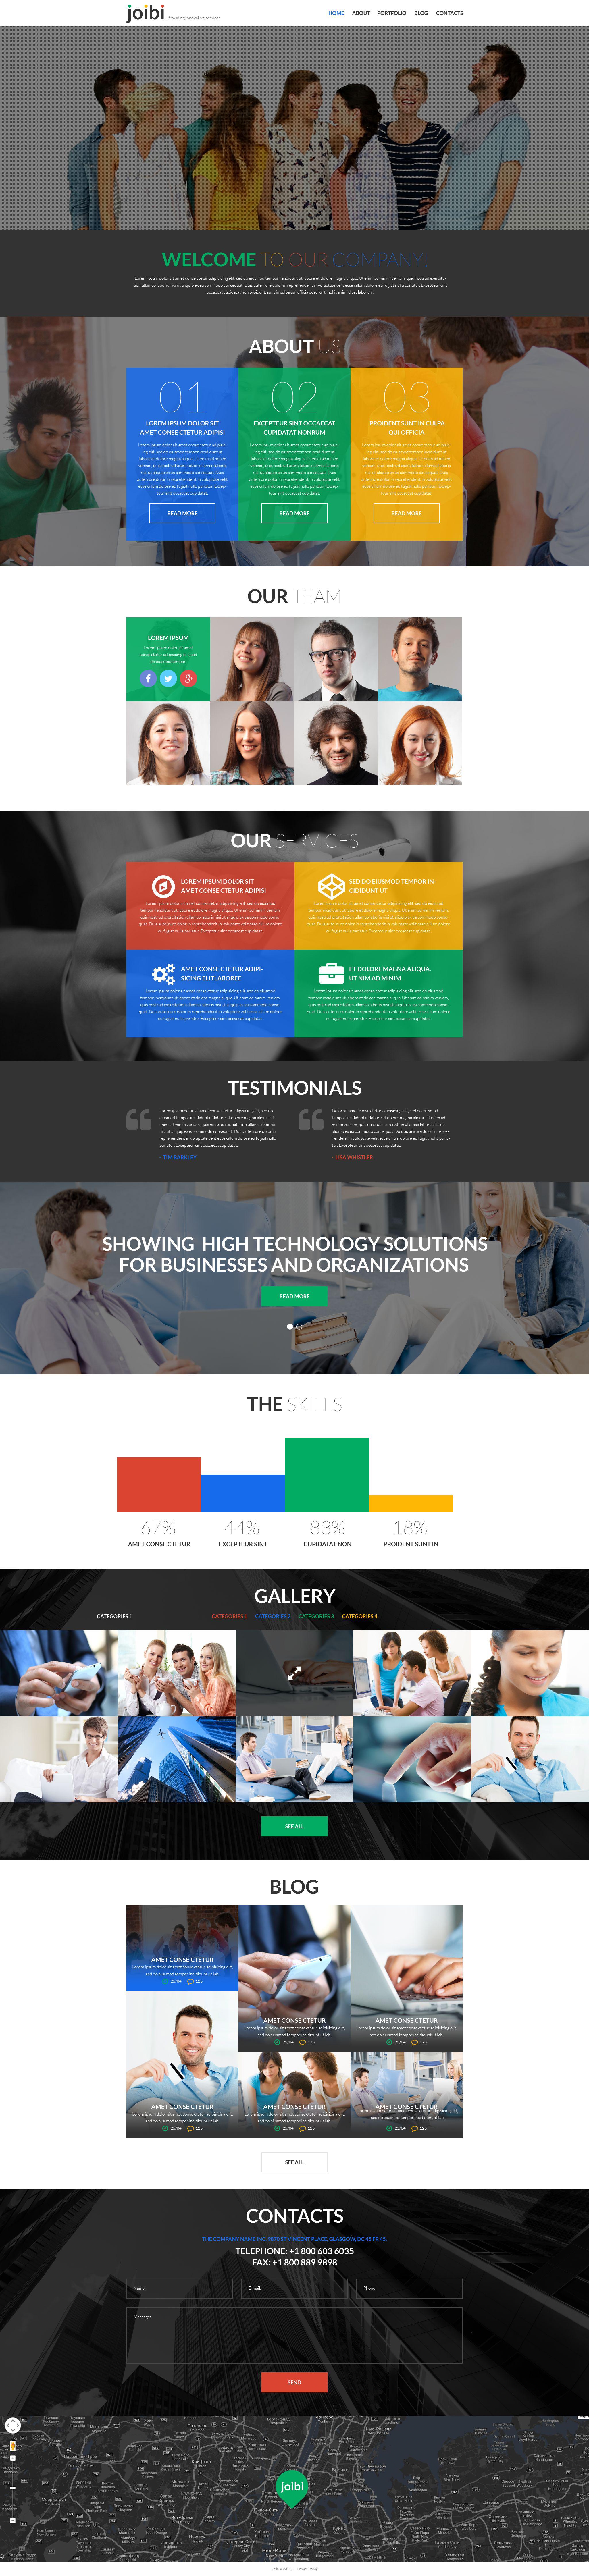 """Business Services Promotion"" - адаптивний WordPress шаблон №52442 - скріншот"